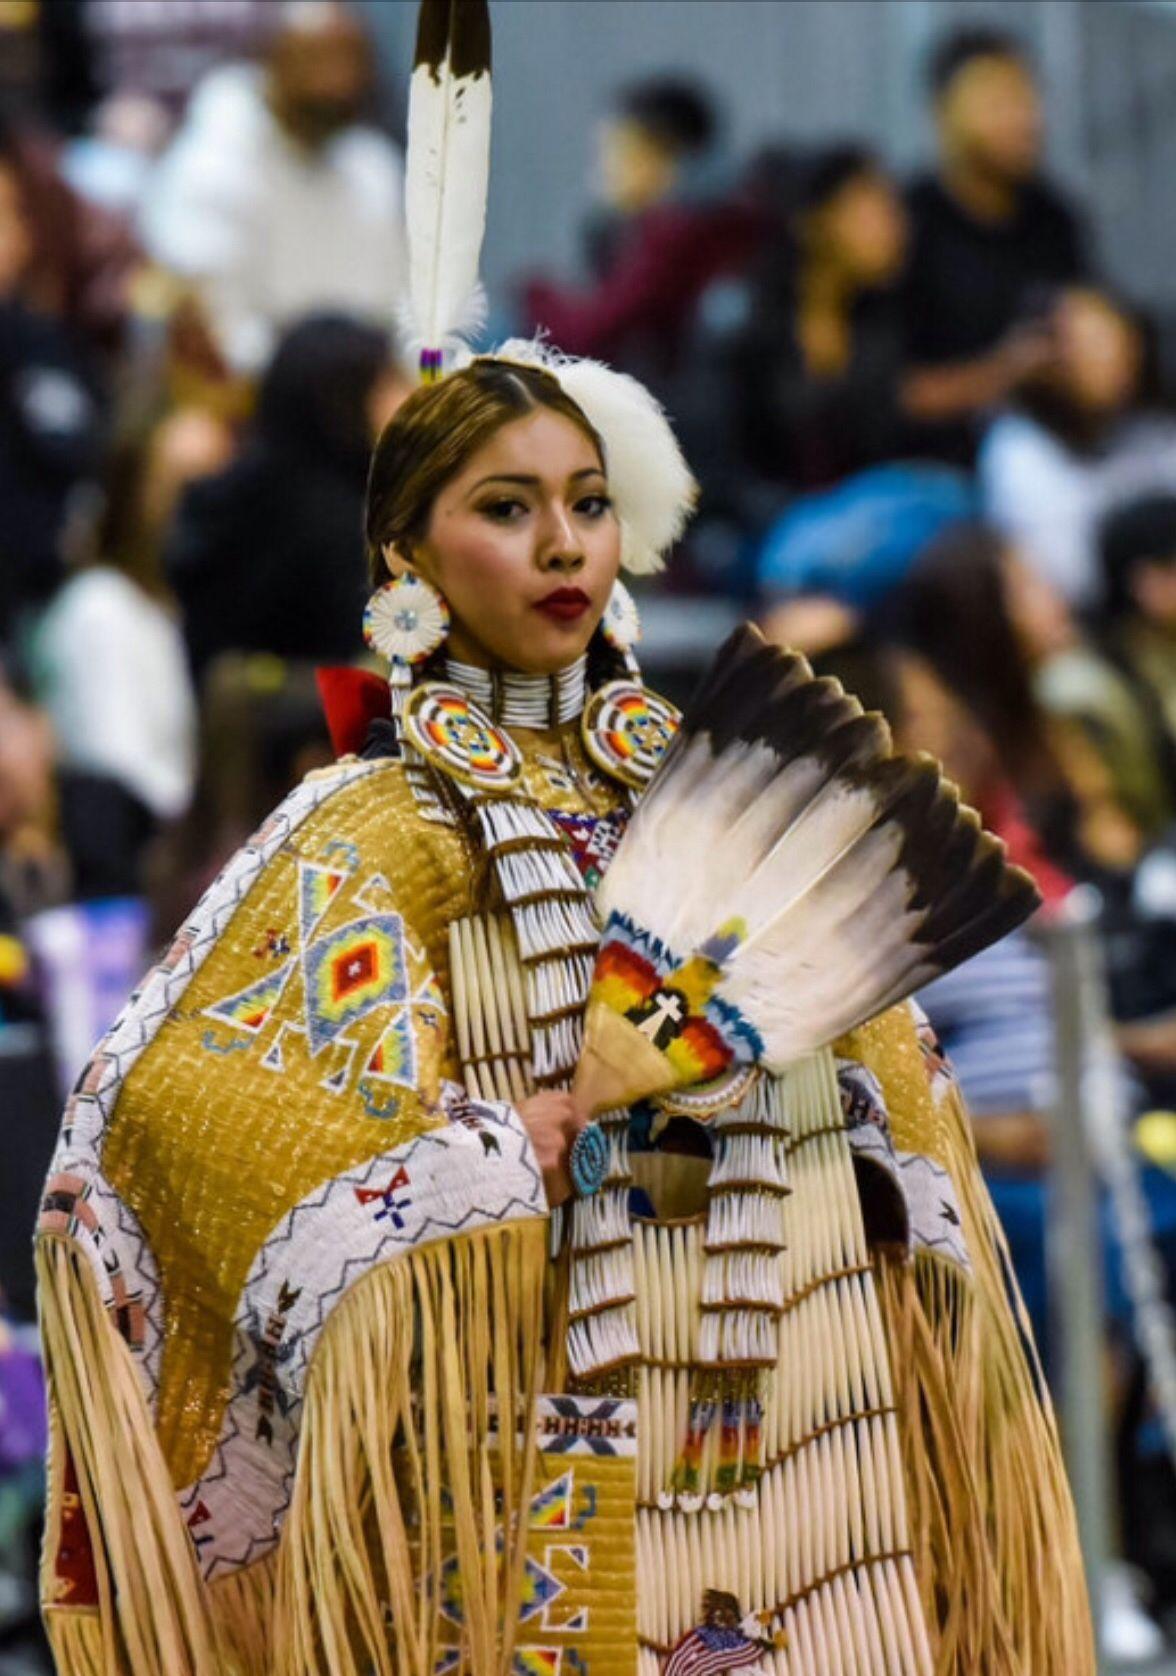 Native American Beauty Women Historical Costume dress New Woman Cosplay Beauty